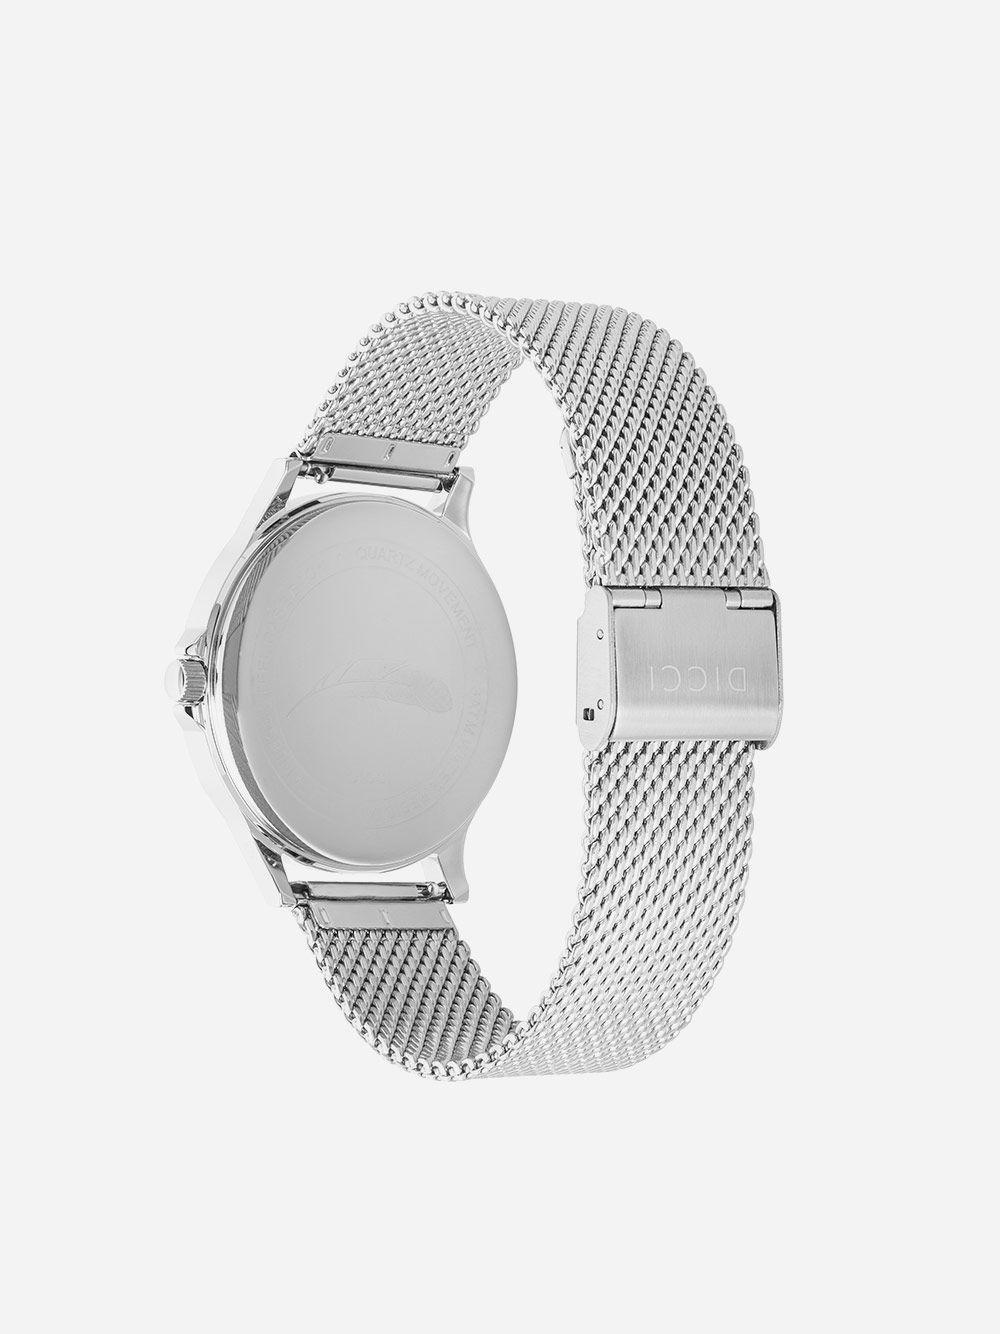 Silver Watch Positano Mesh Black   Dicci